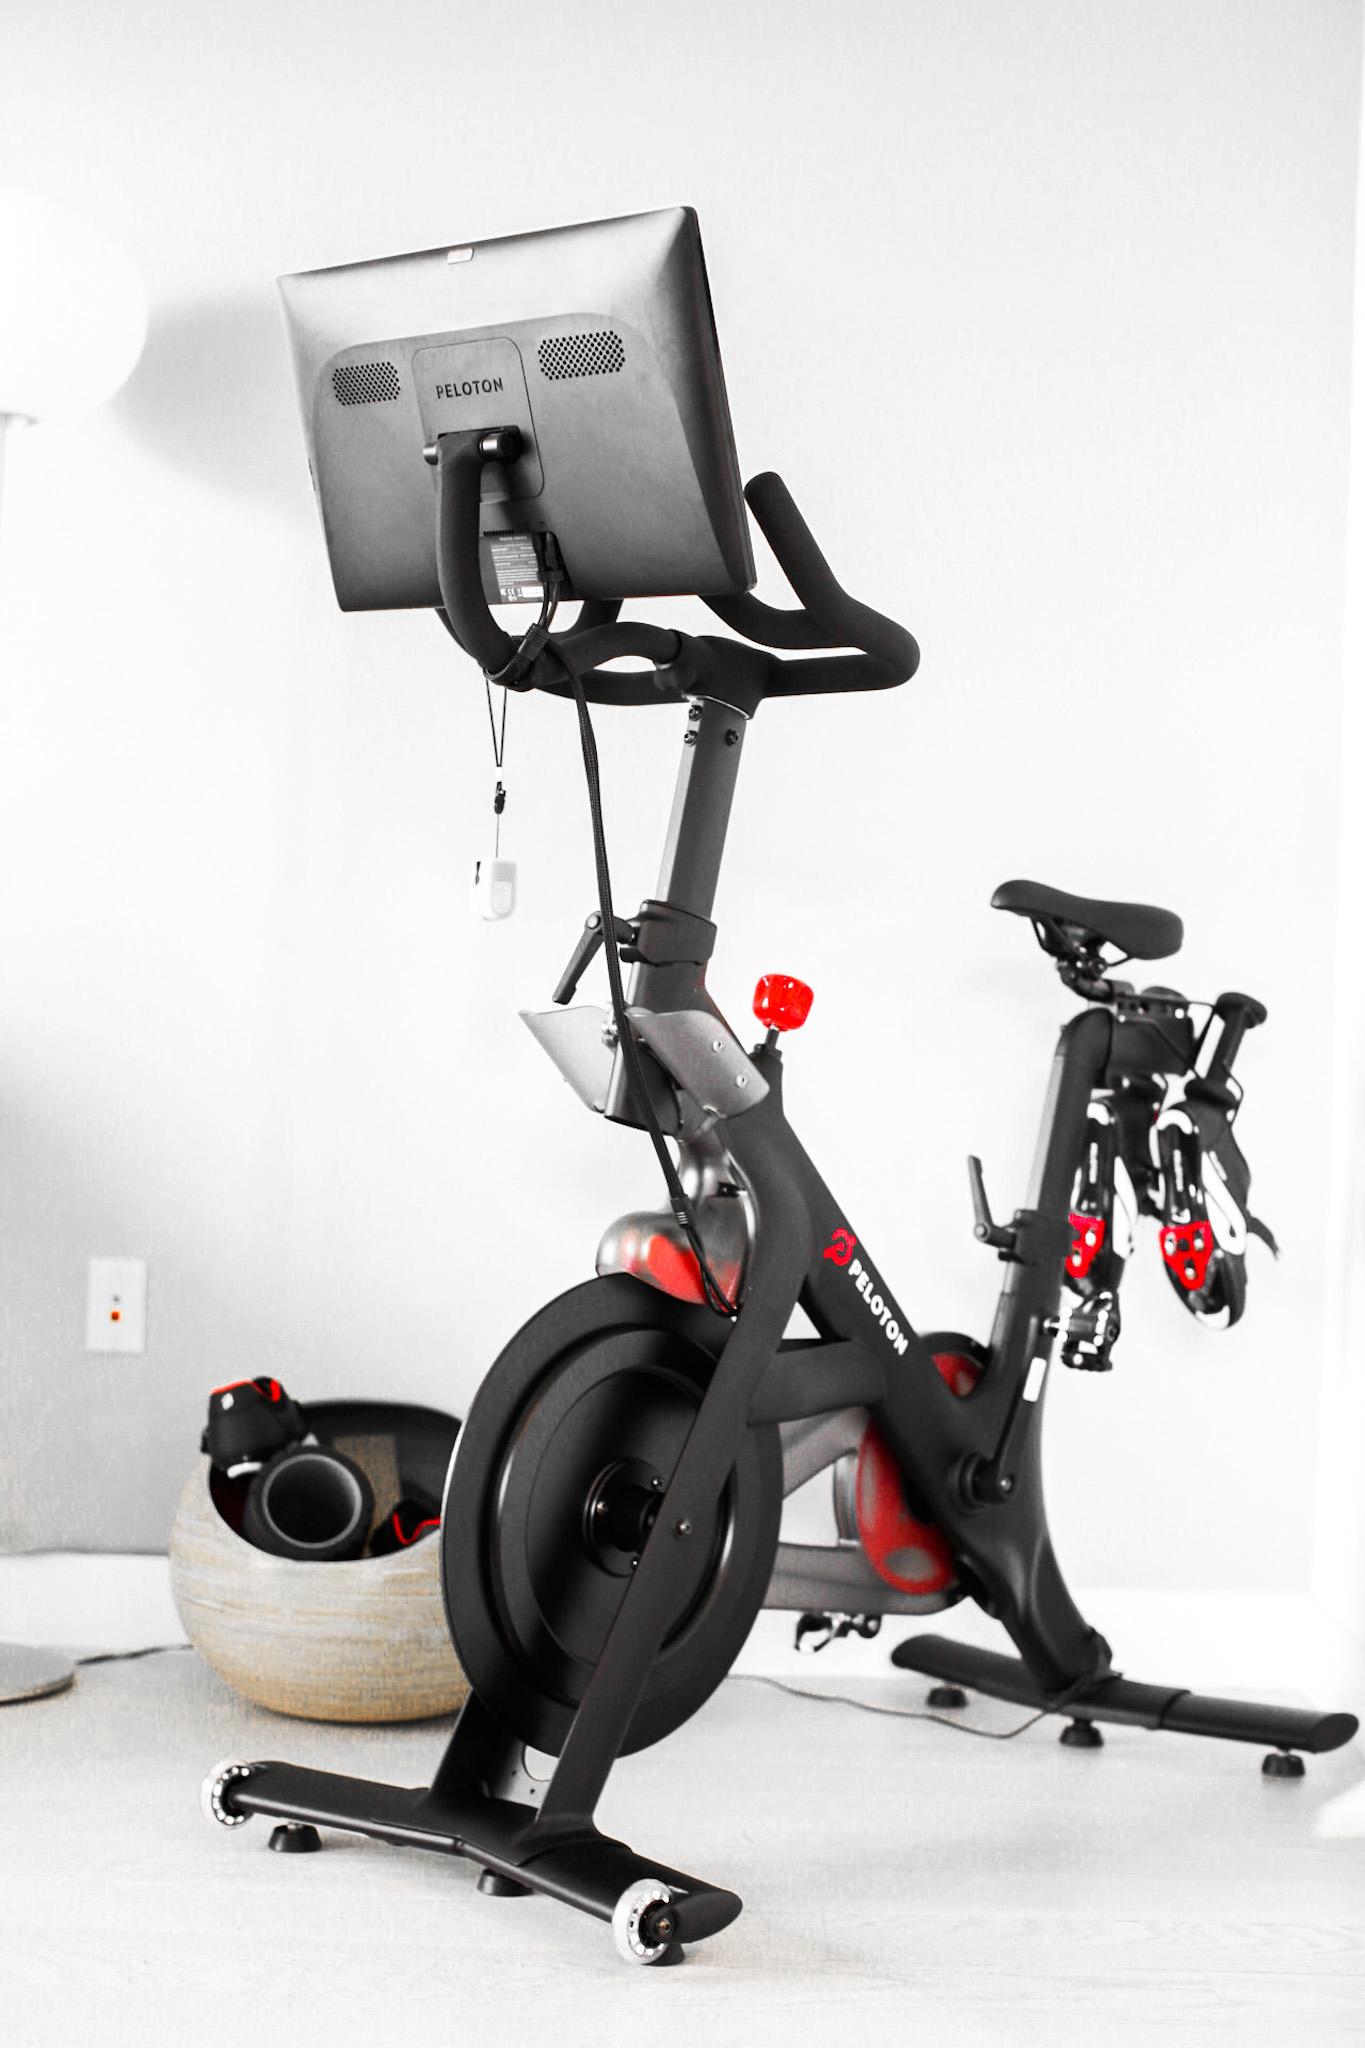 the peloton bike